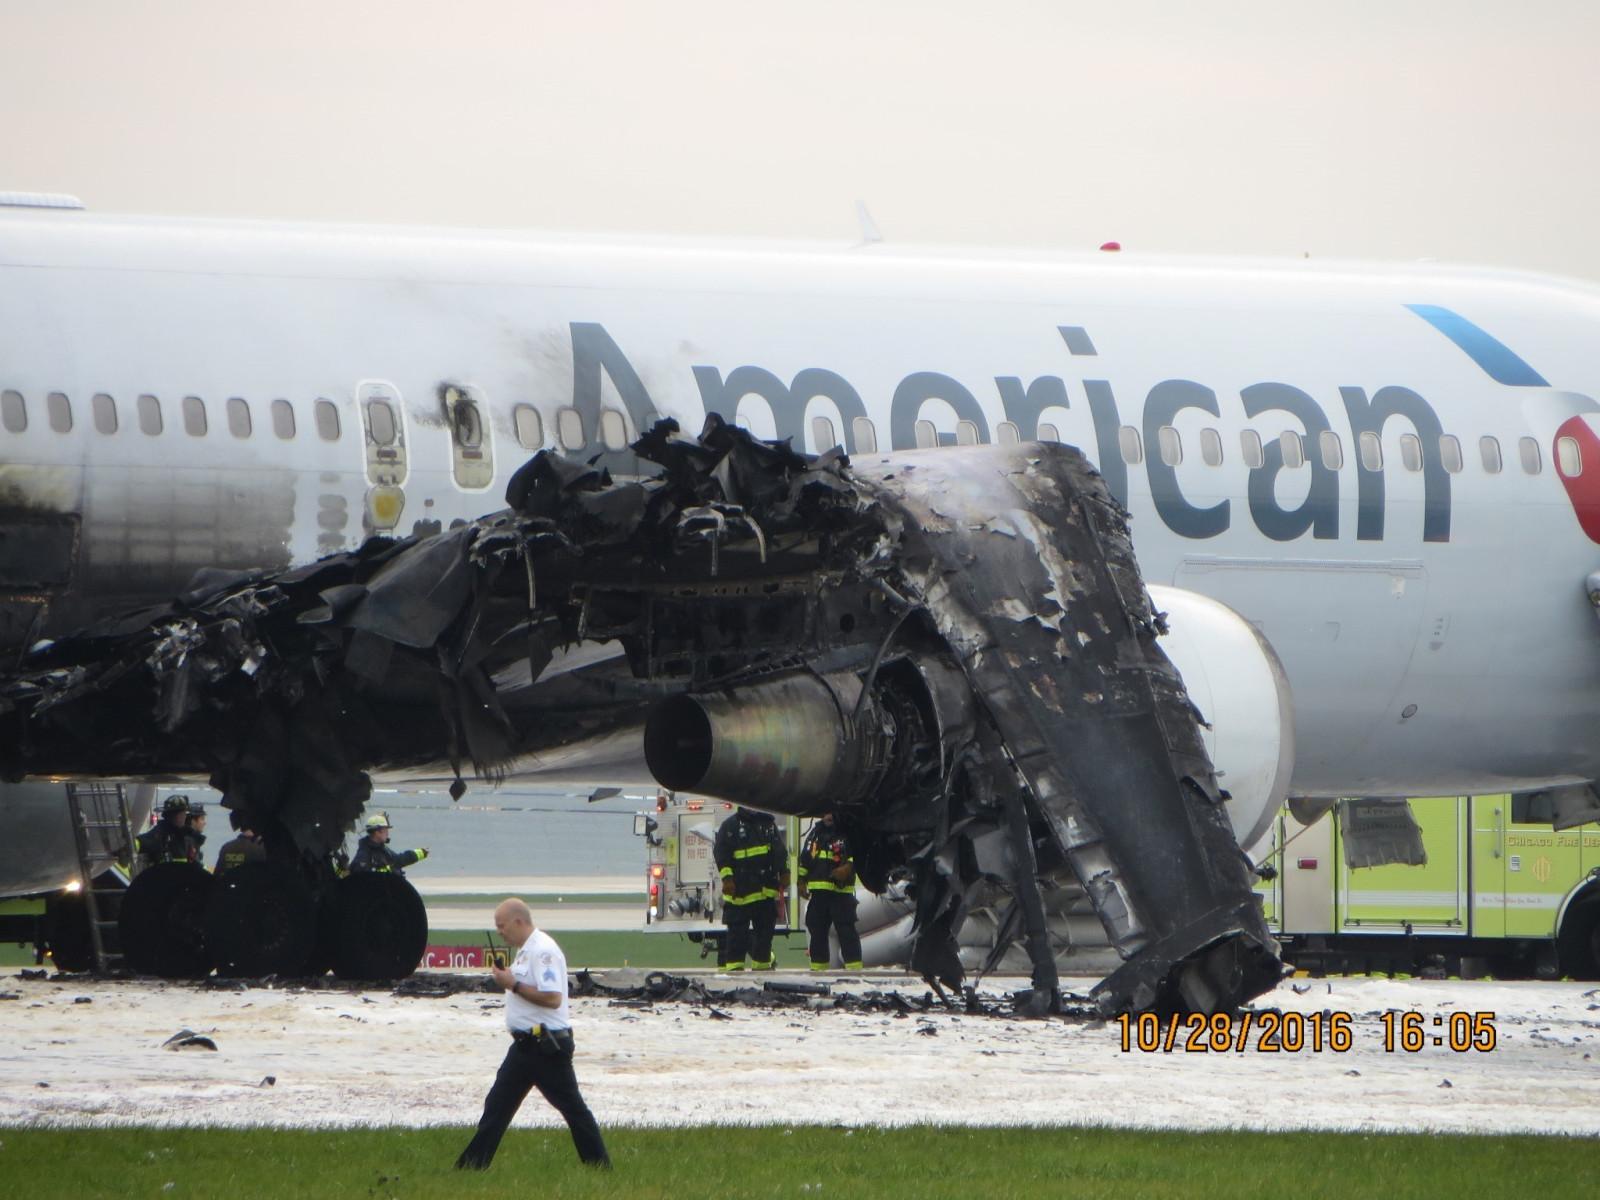 American Airlines Flight 383 fire: Pilot blind spots hurt